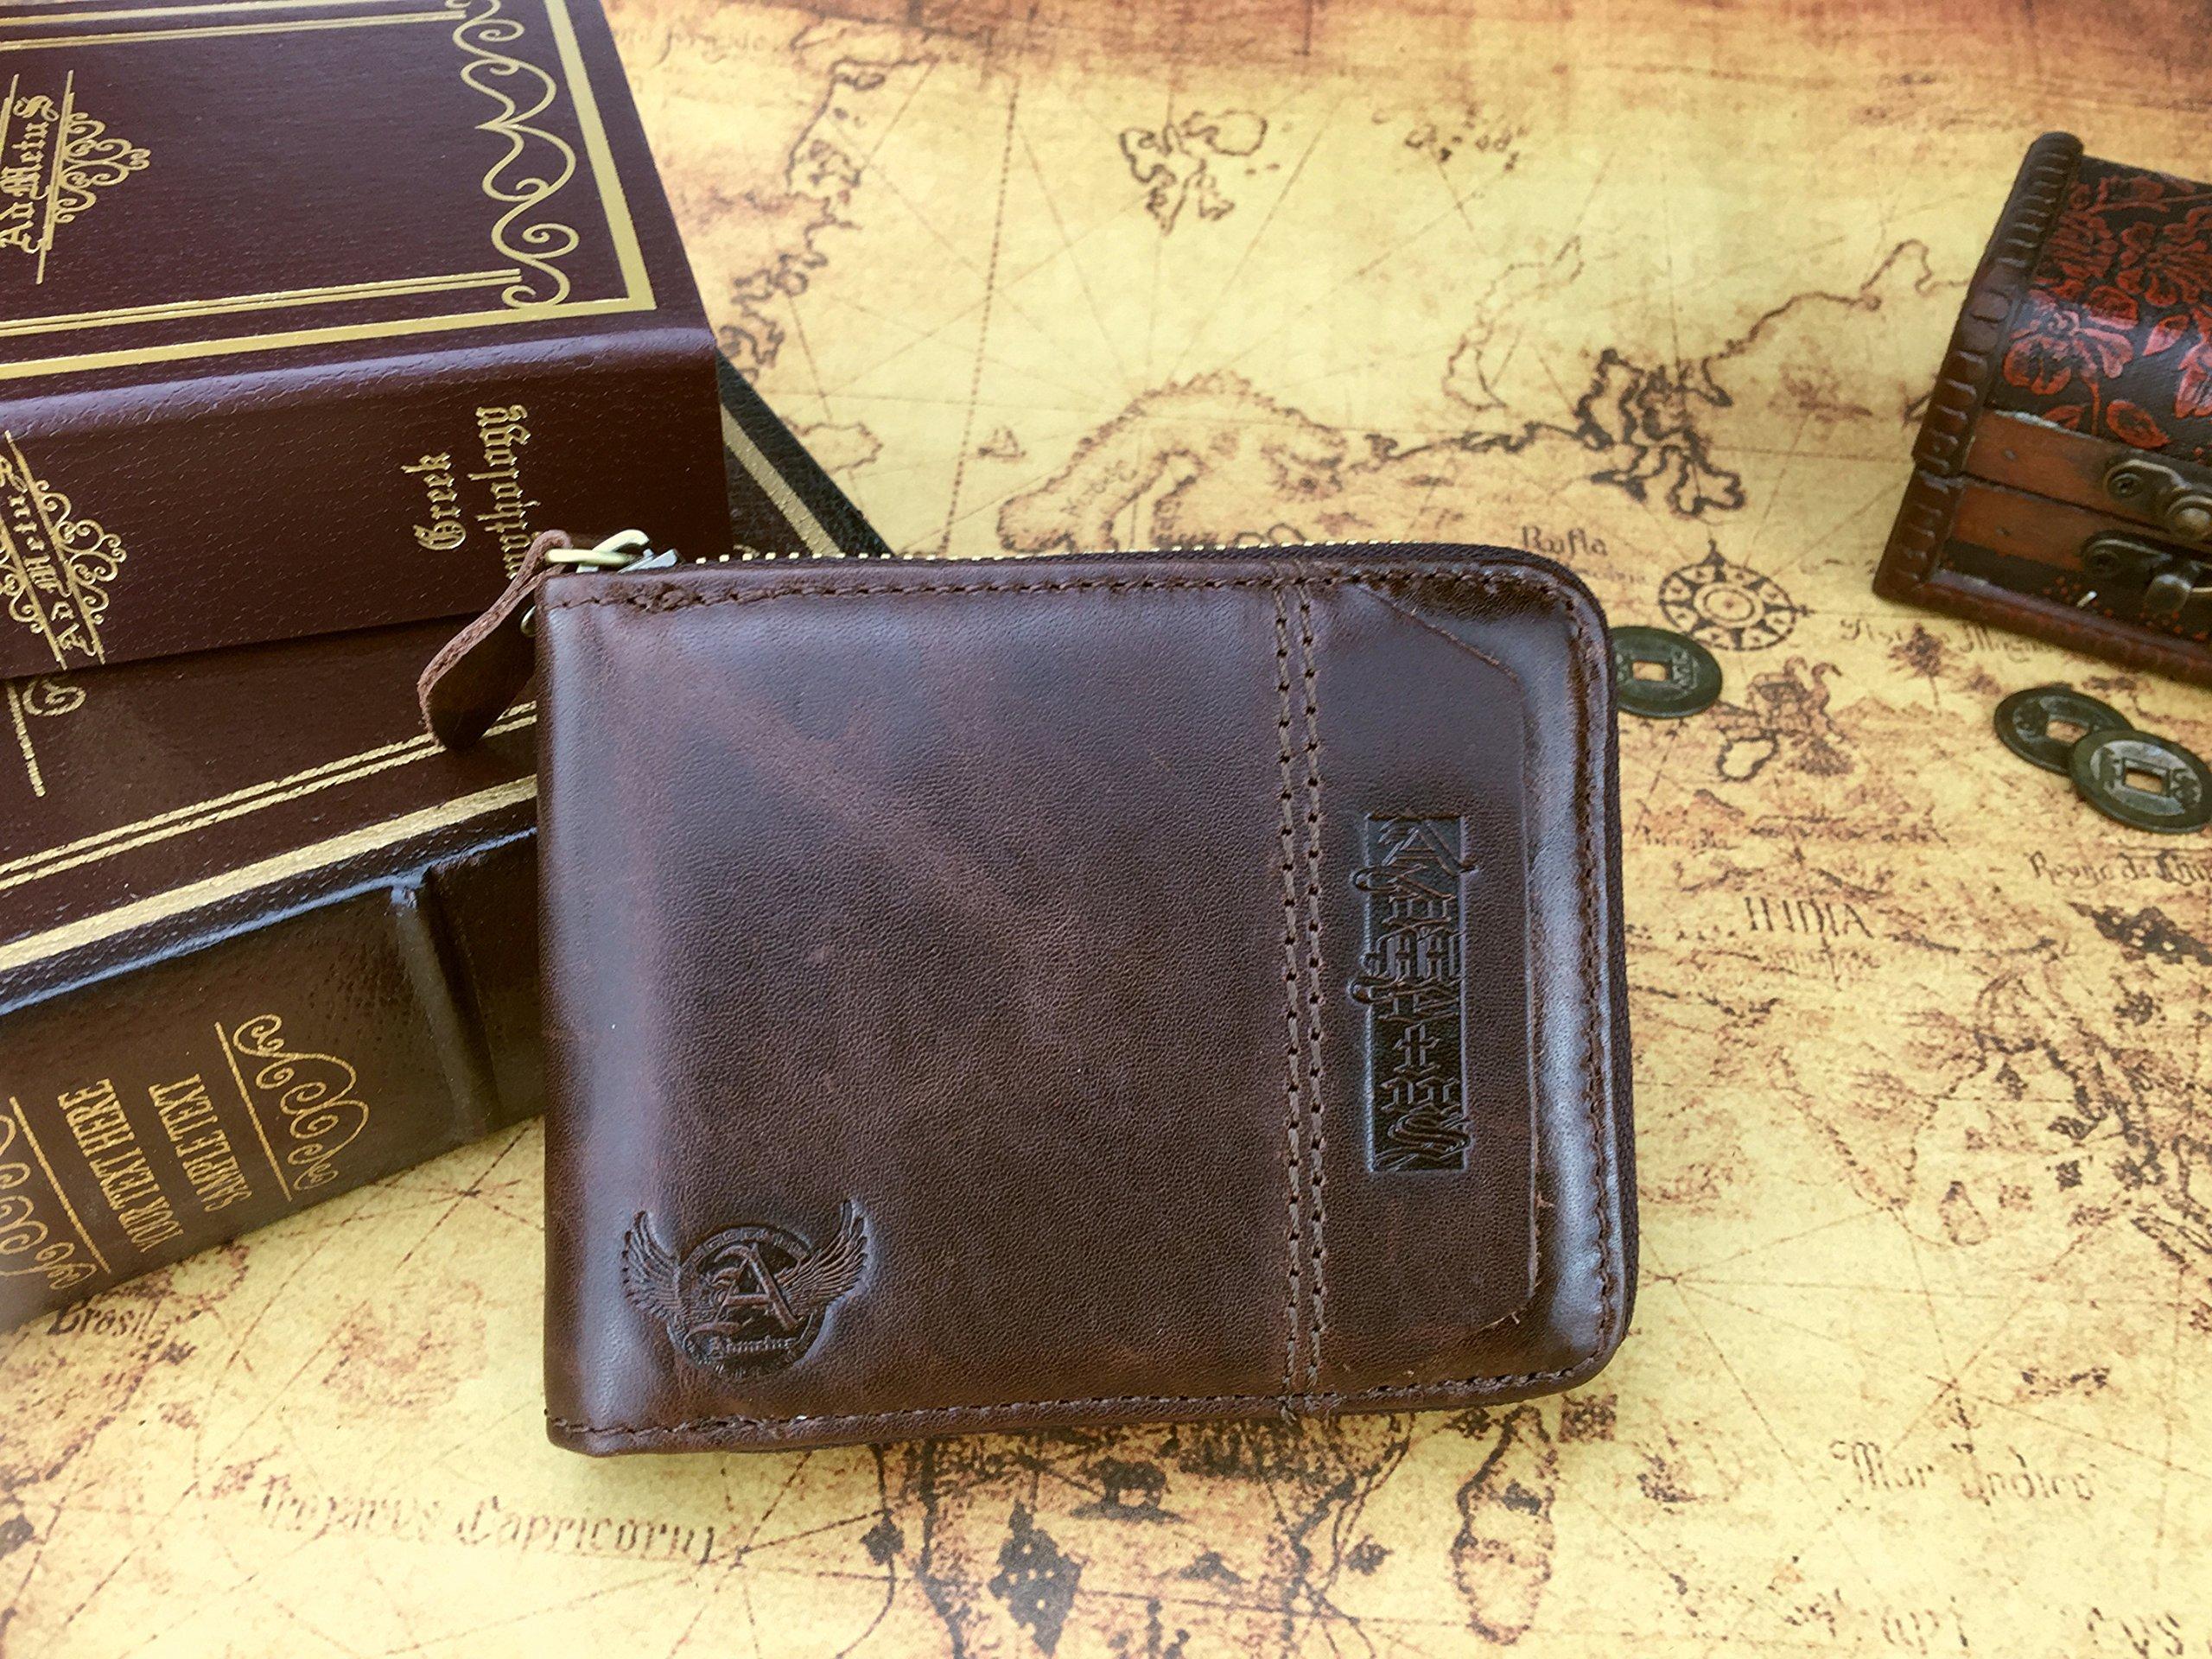 Admetus Men's Genuine Leather Short Zip-around Bifold Wallet (brown) by Admetus (Image #5)